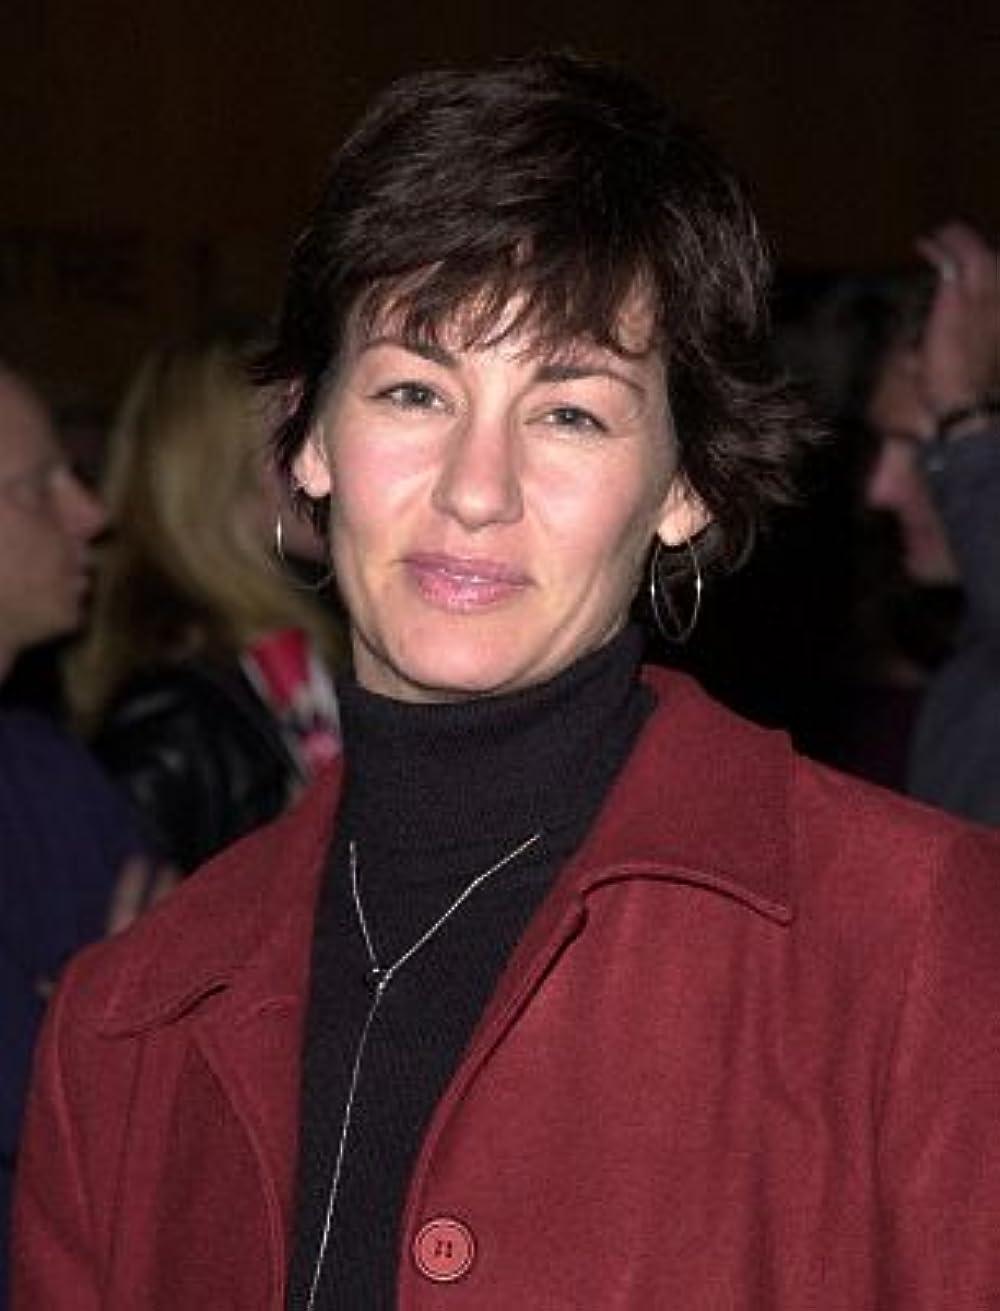 Julie Cypher